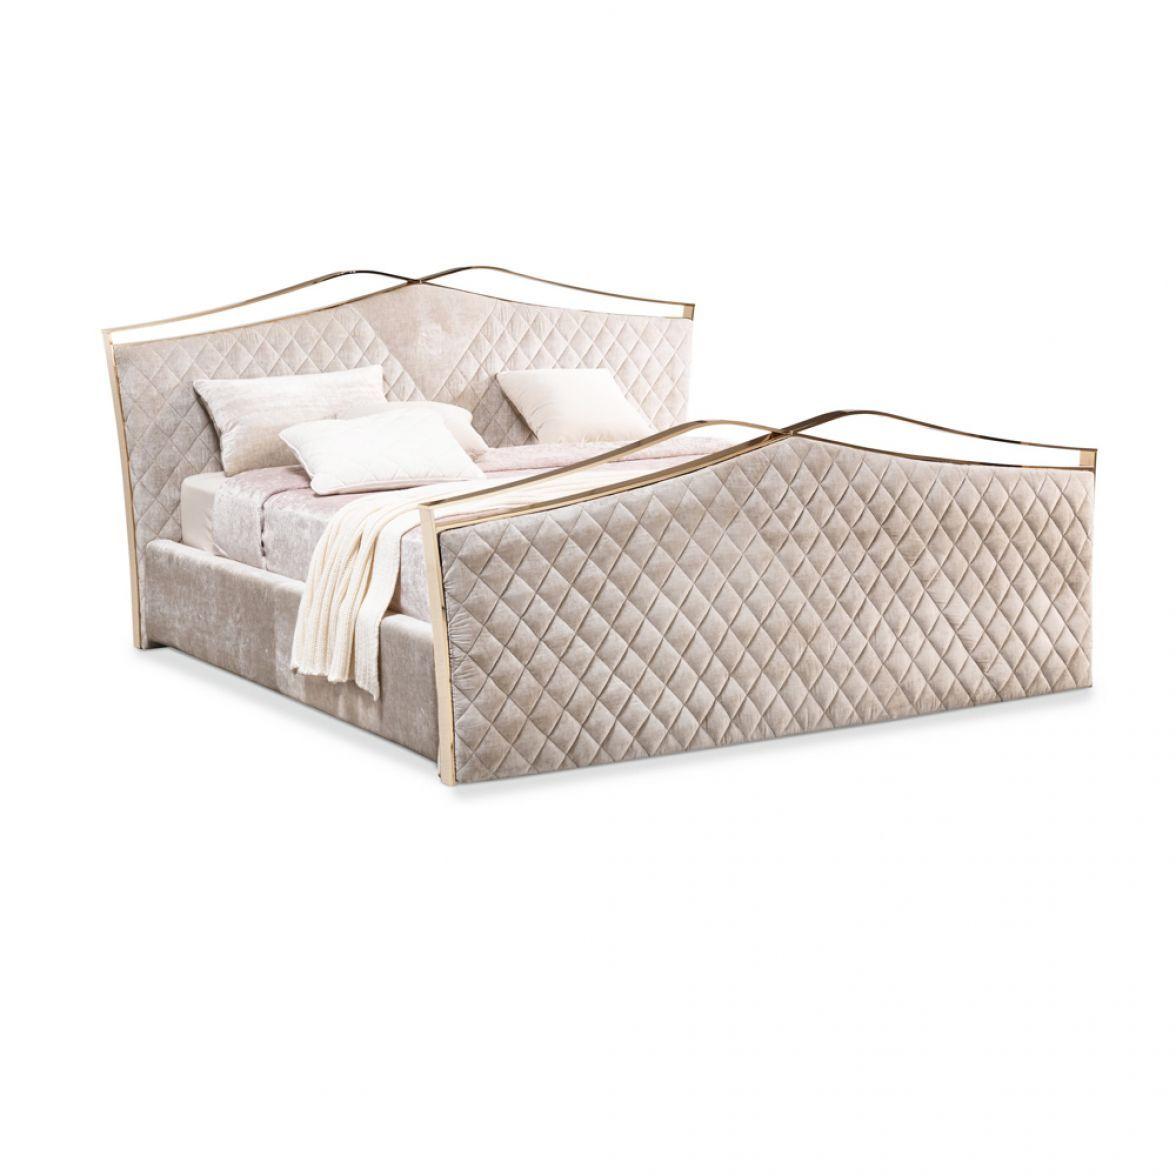 Valentino bed фото цена